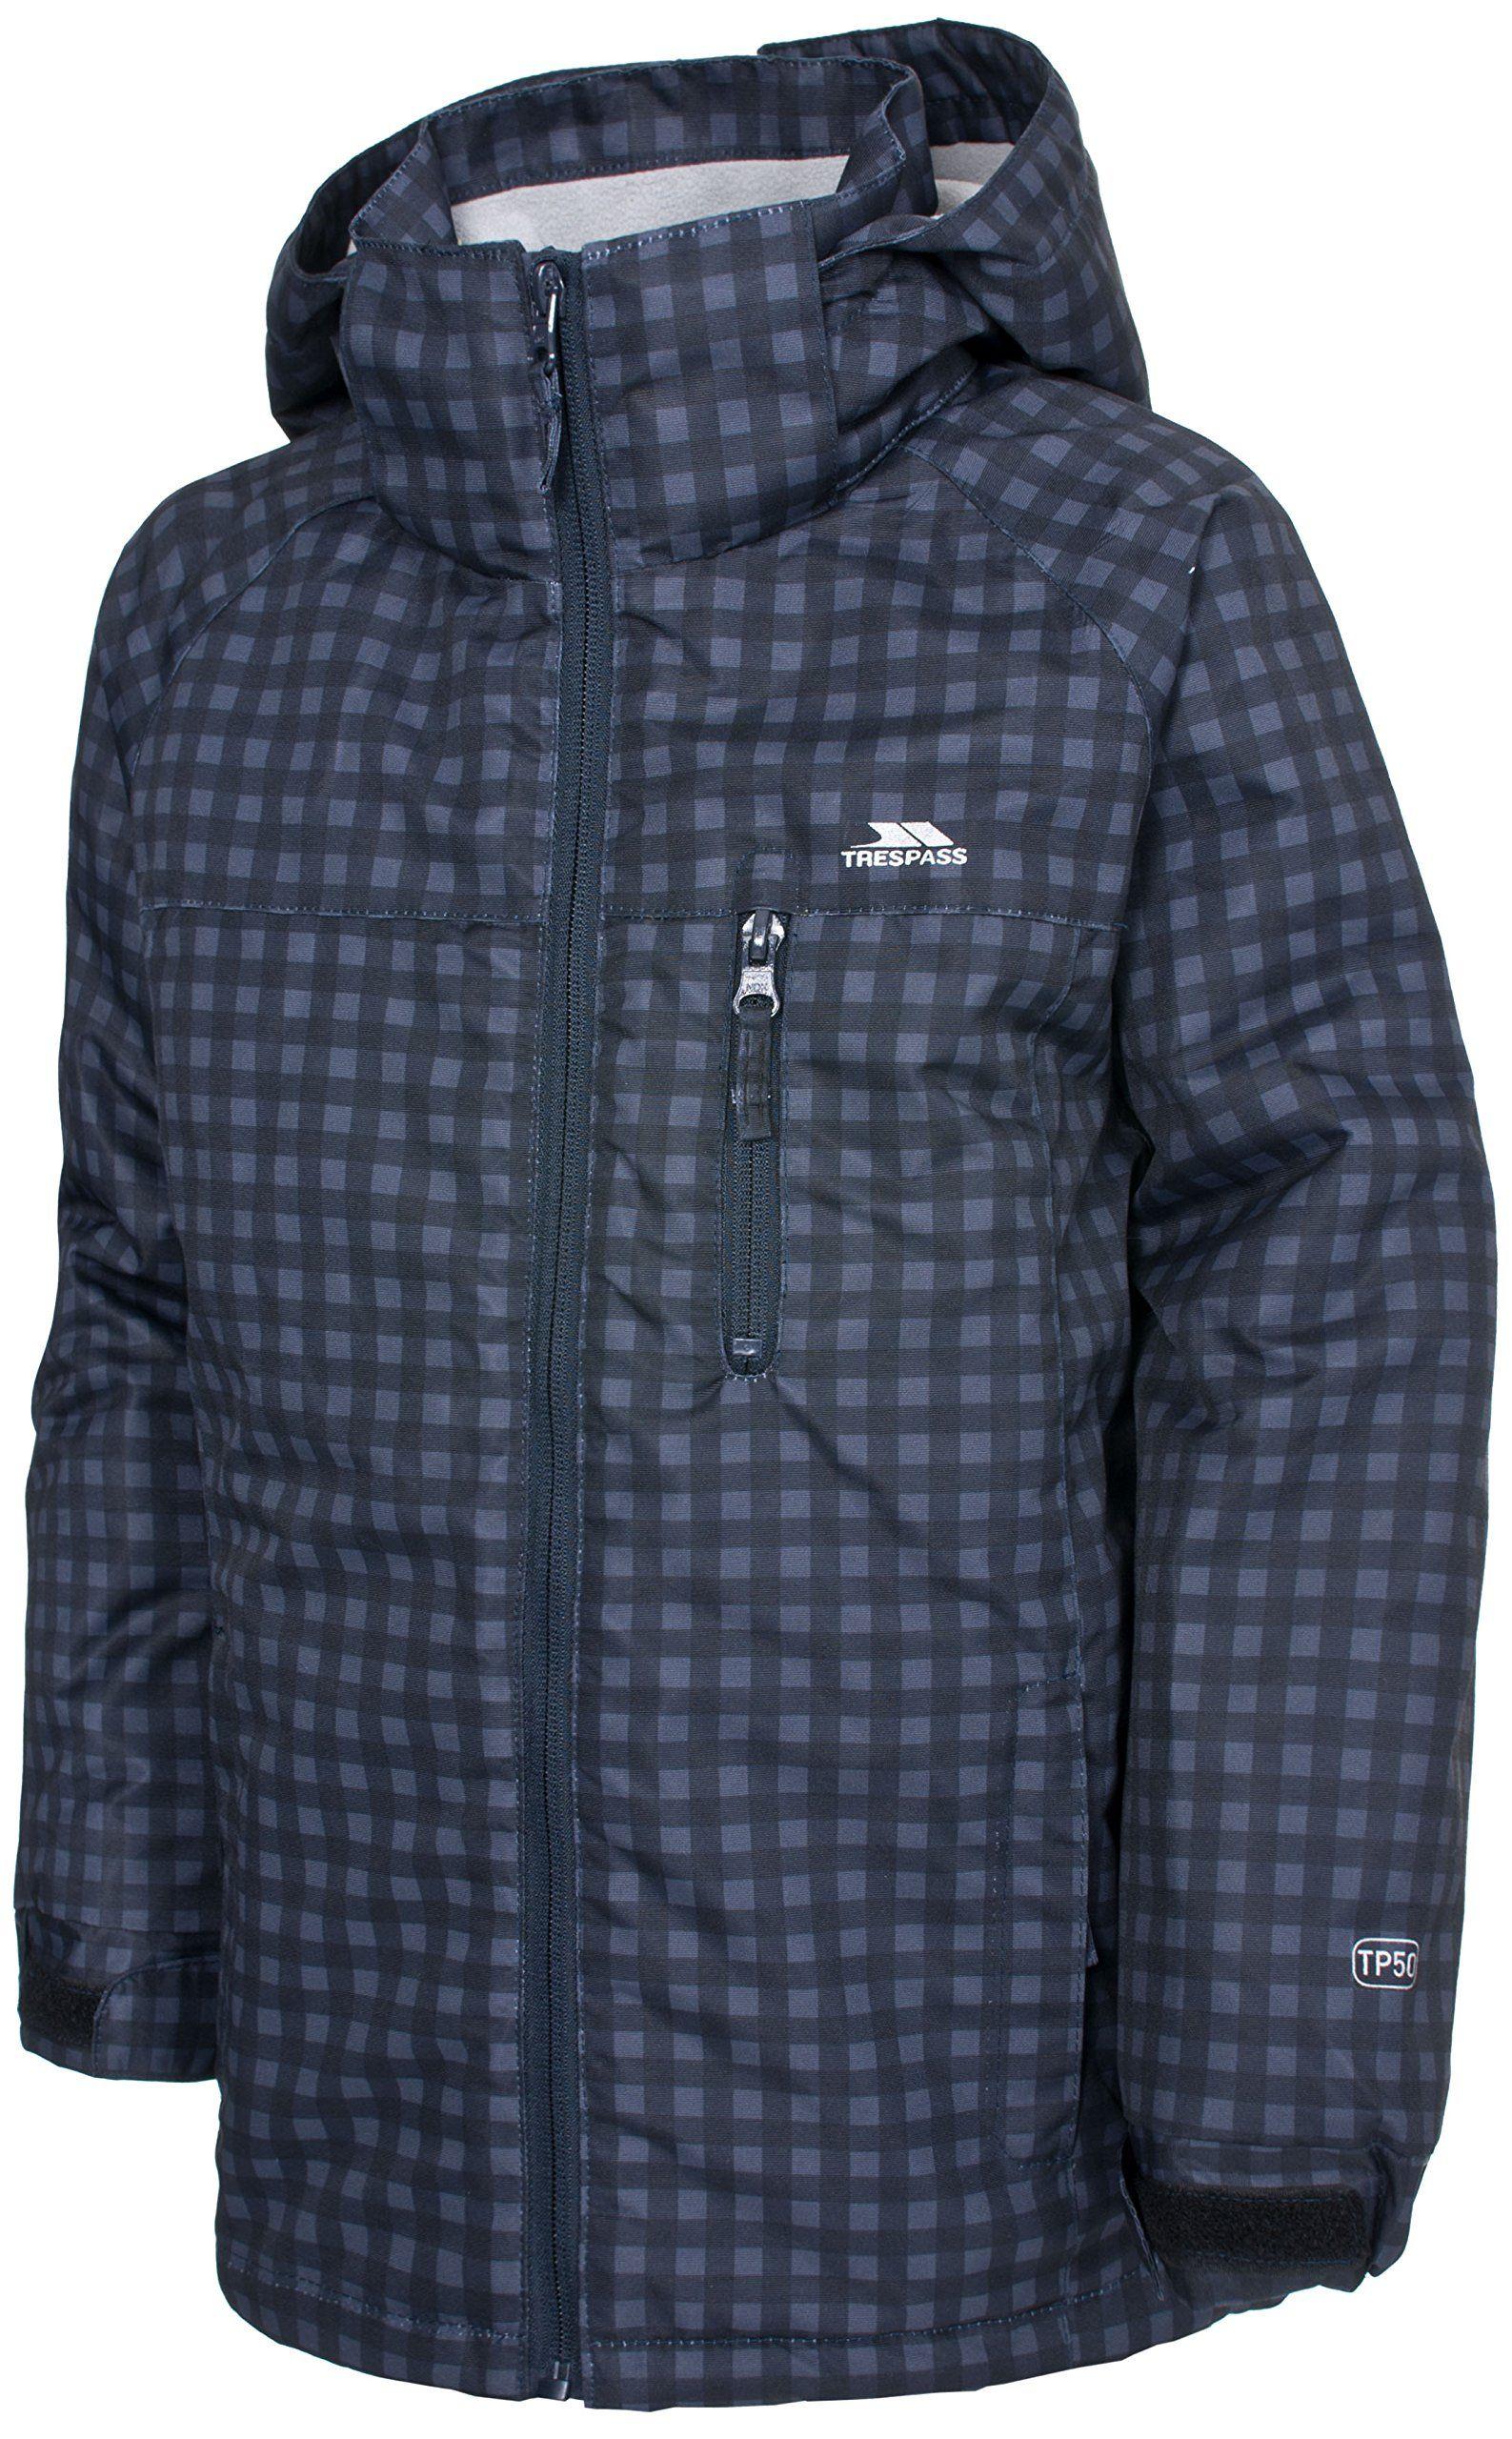 91c2a15ca6fc Trespass boys Trespass Boys Jace Waterproof Padded Rain Coat Jacket ...